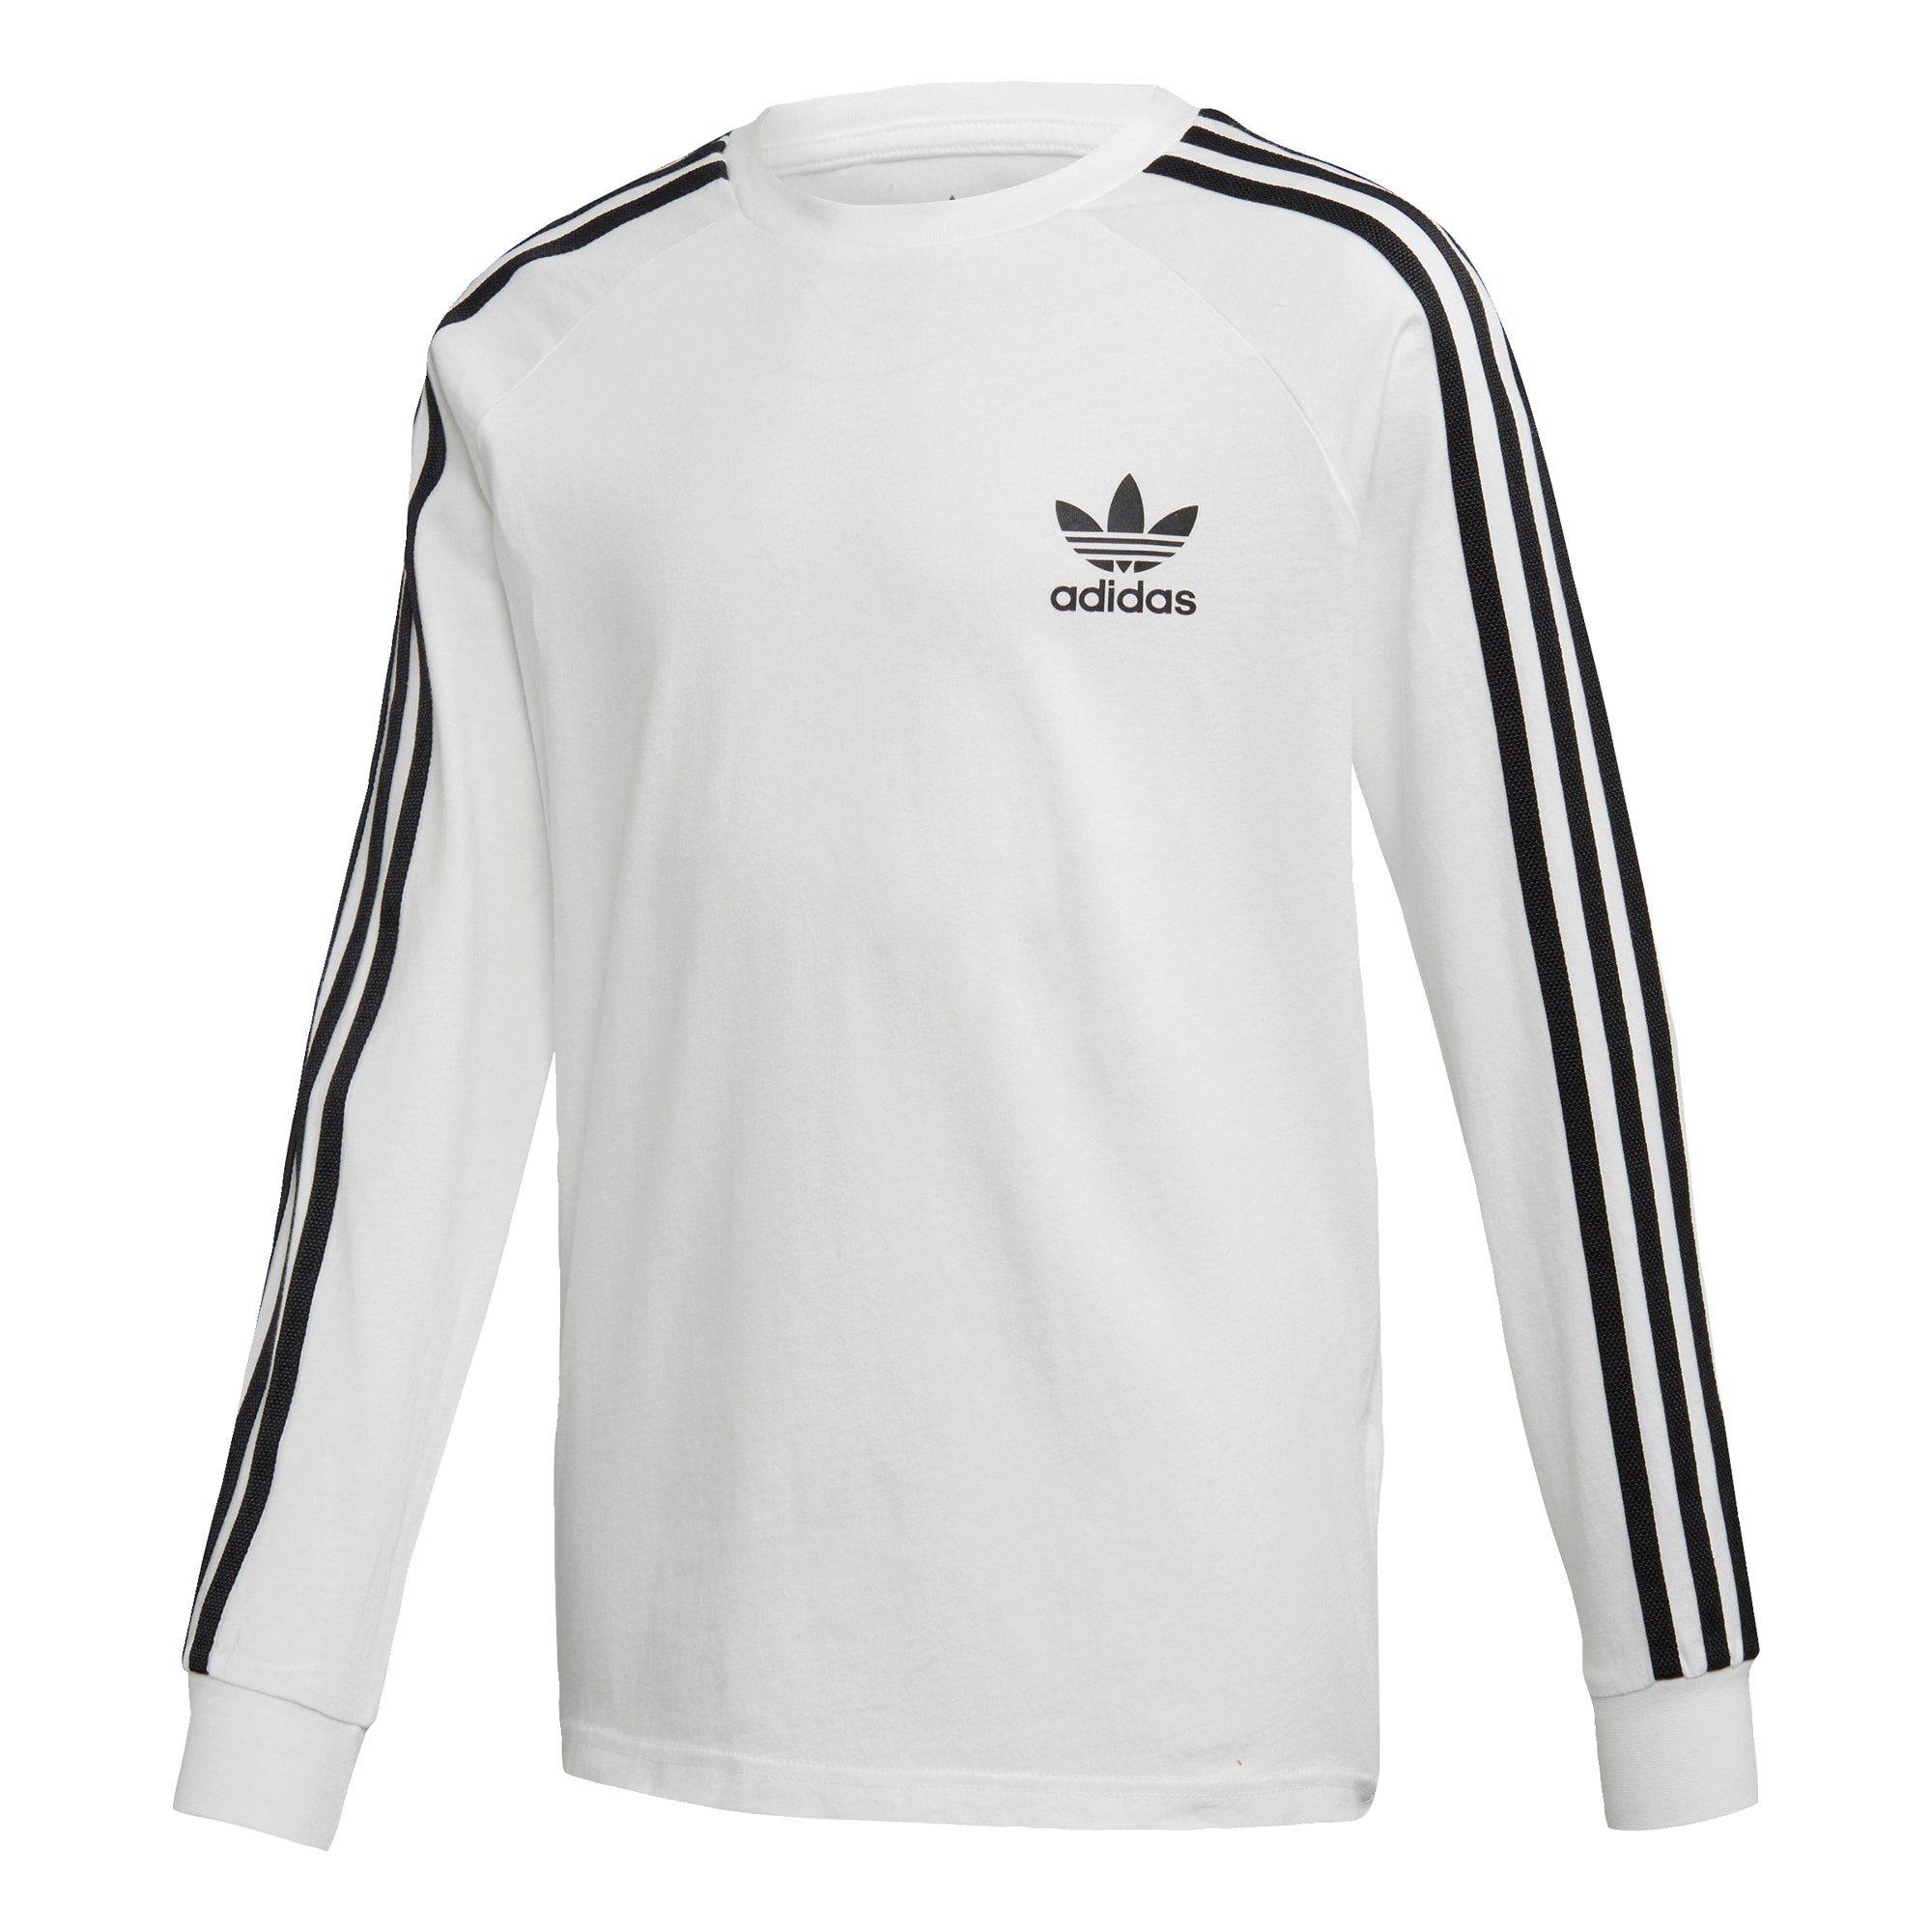 adidas Originals Langarmshirt »3 Streifen Longsleeve« adicolor online kaufen | OTTO